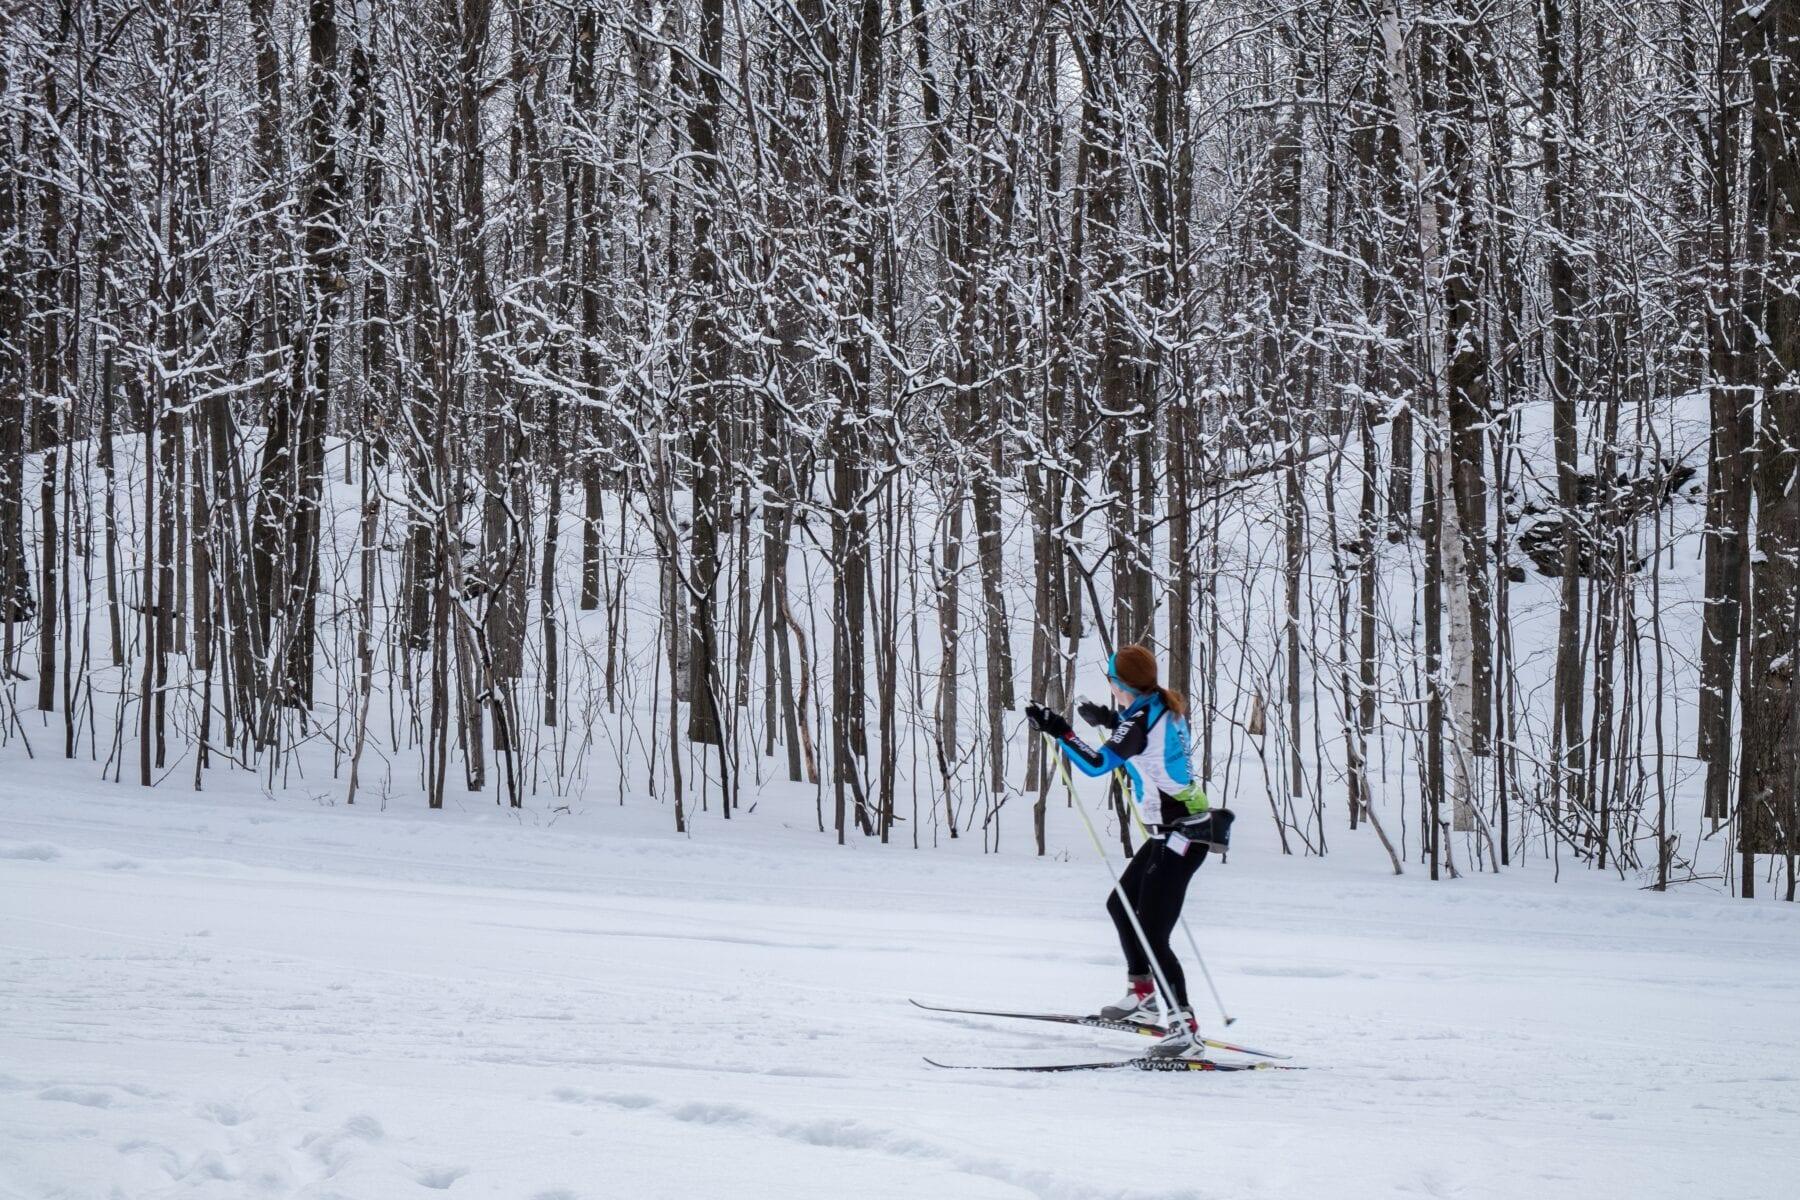 Last skier standing